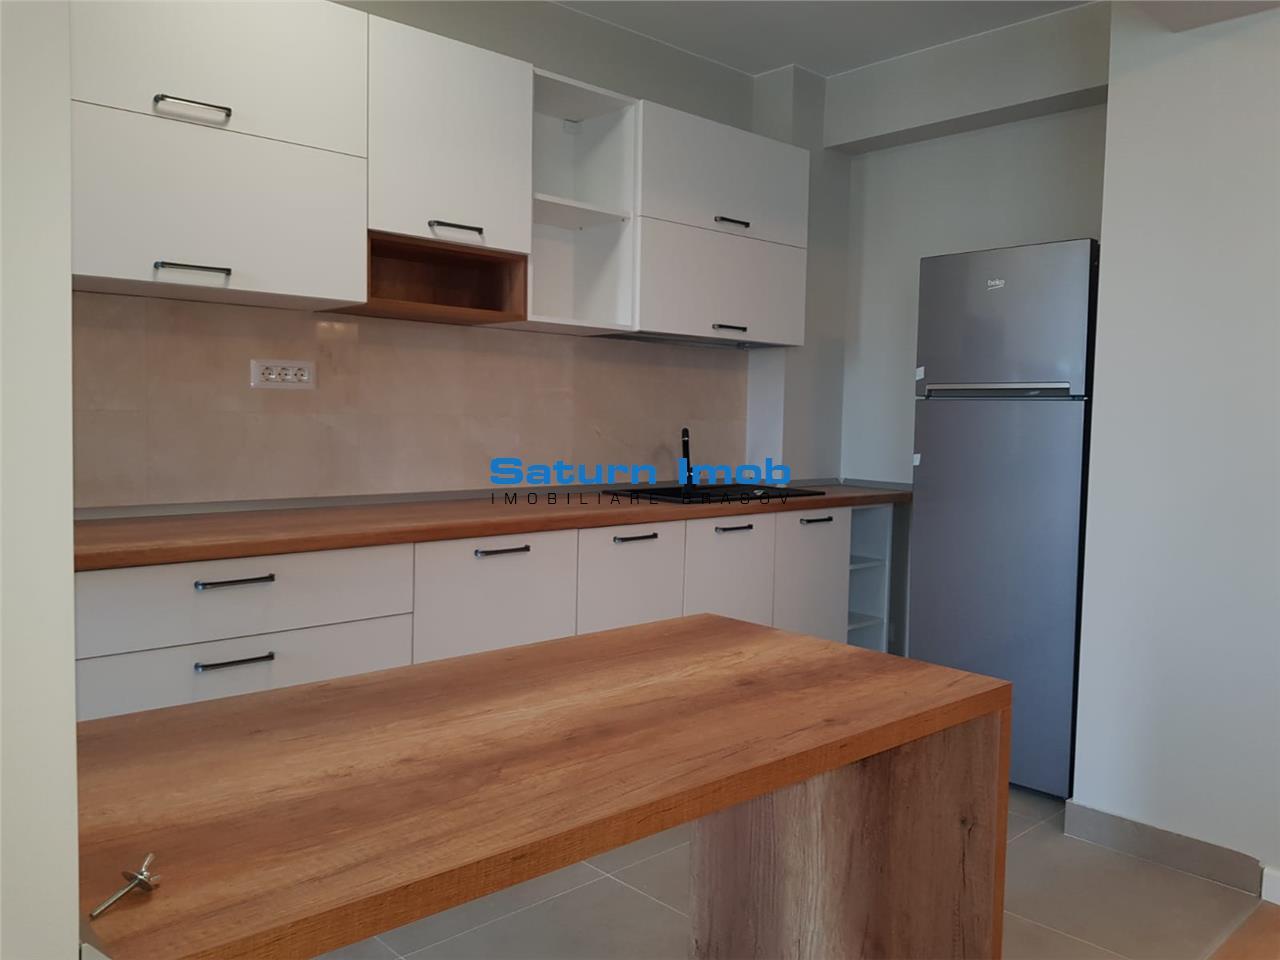 Apartament 3 camere nou si spatios langa metrou Sisesti-Baneasa